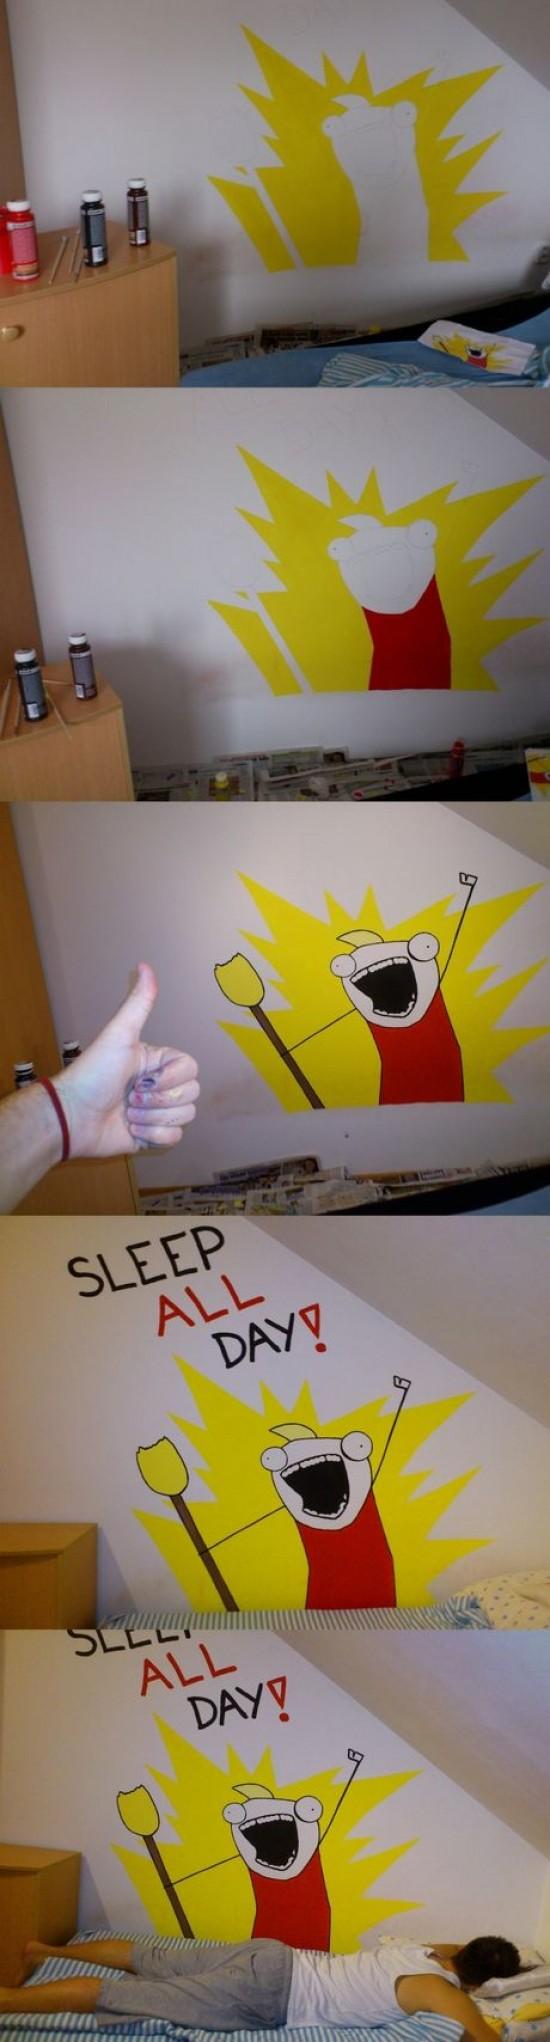 All the things,decoracion,dibujo,dormir,habitacion,pared,pintar